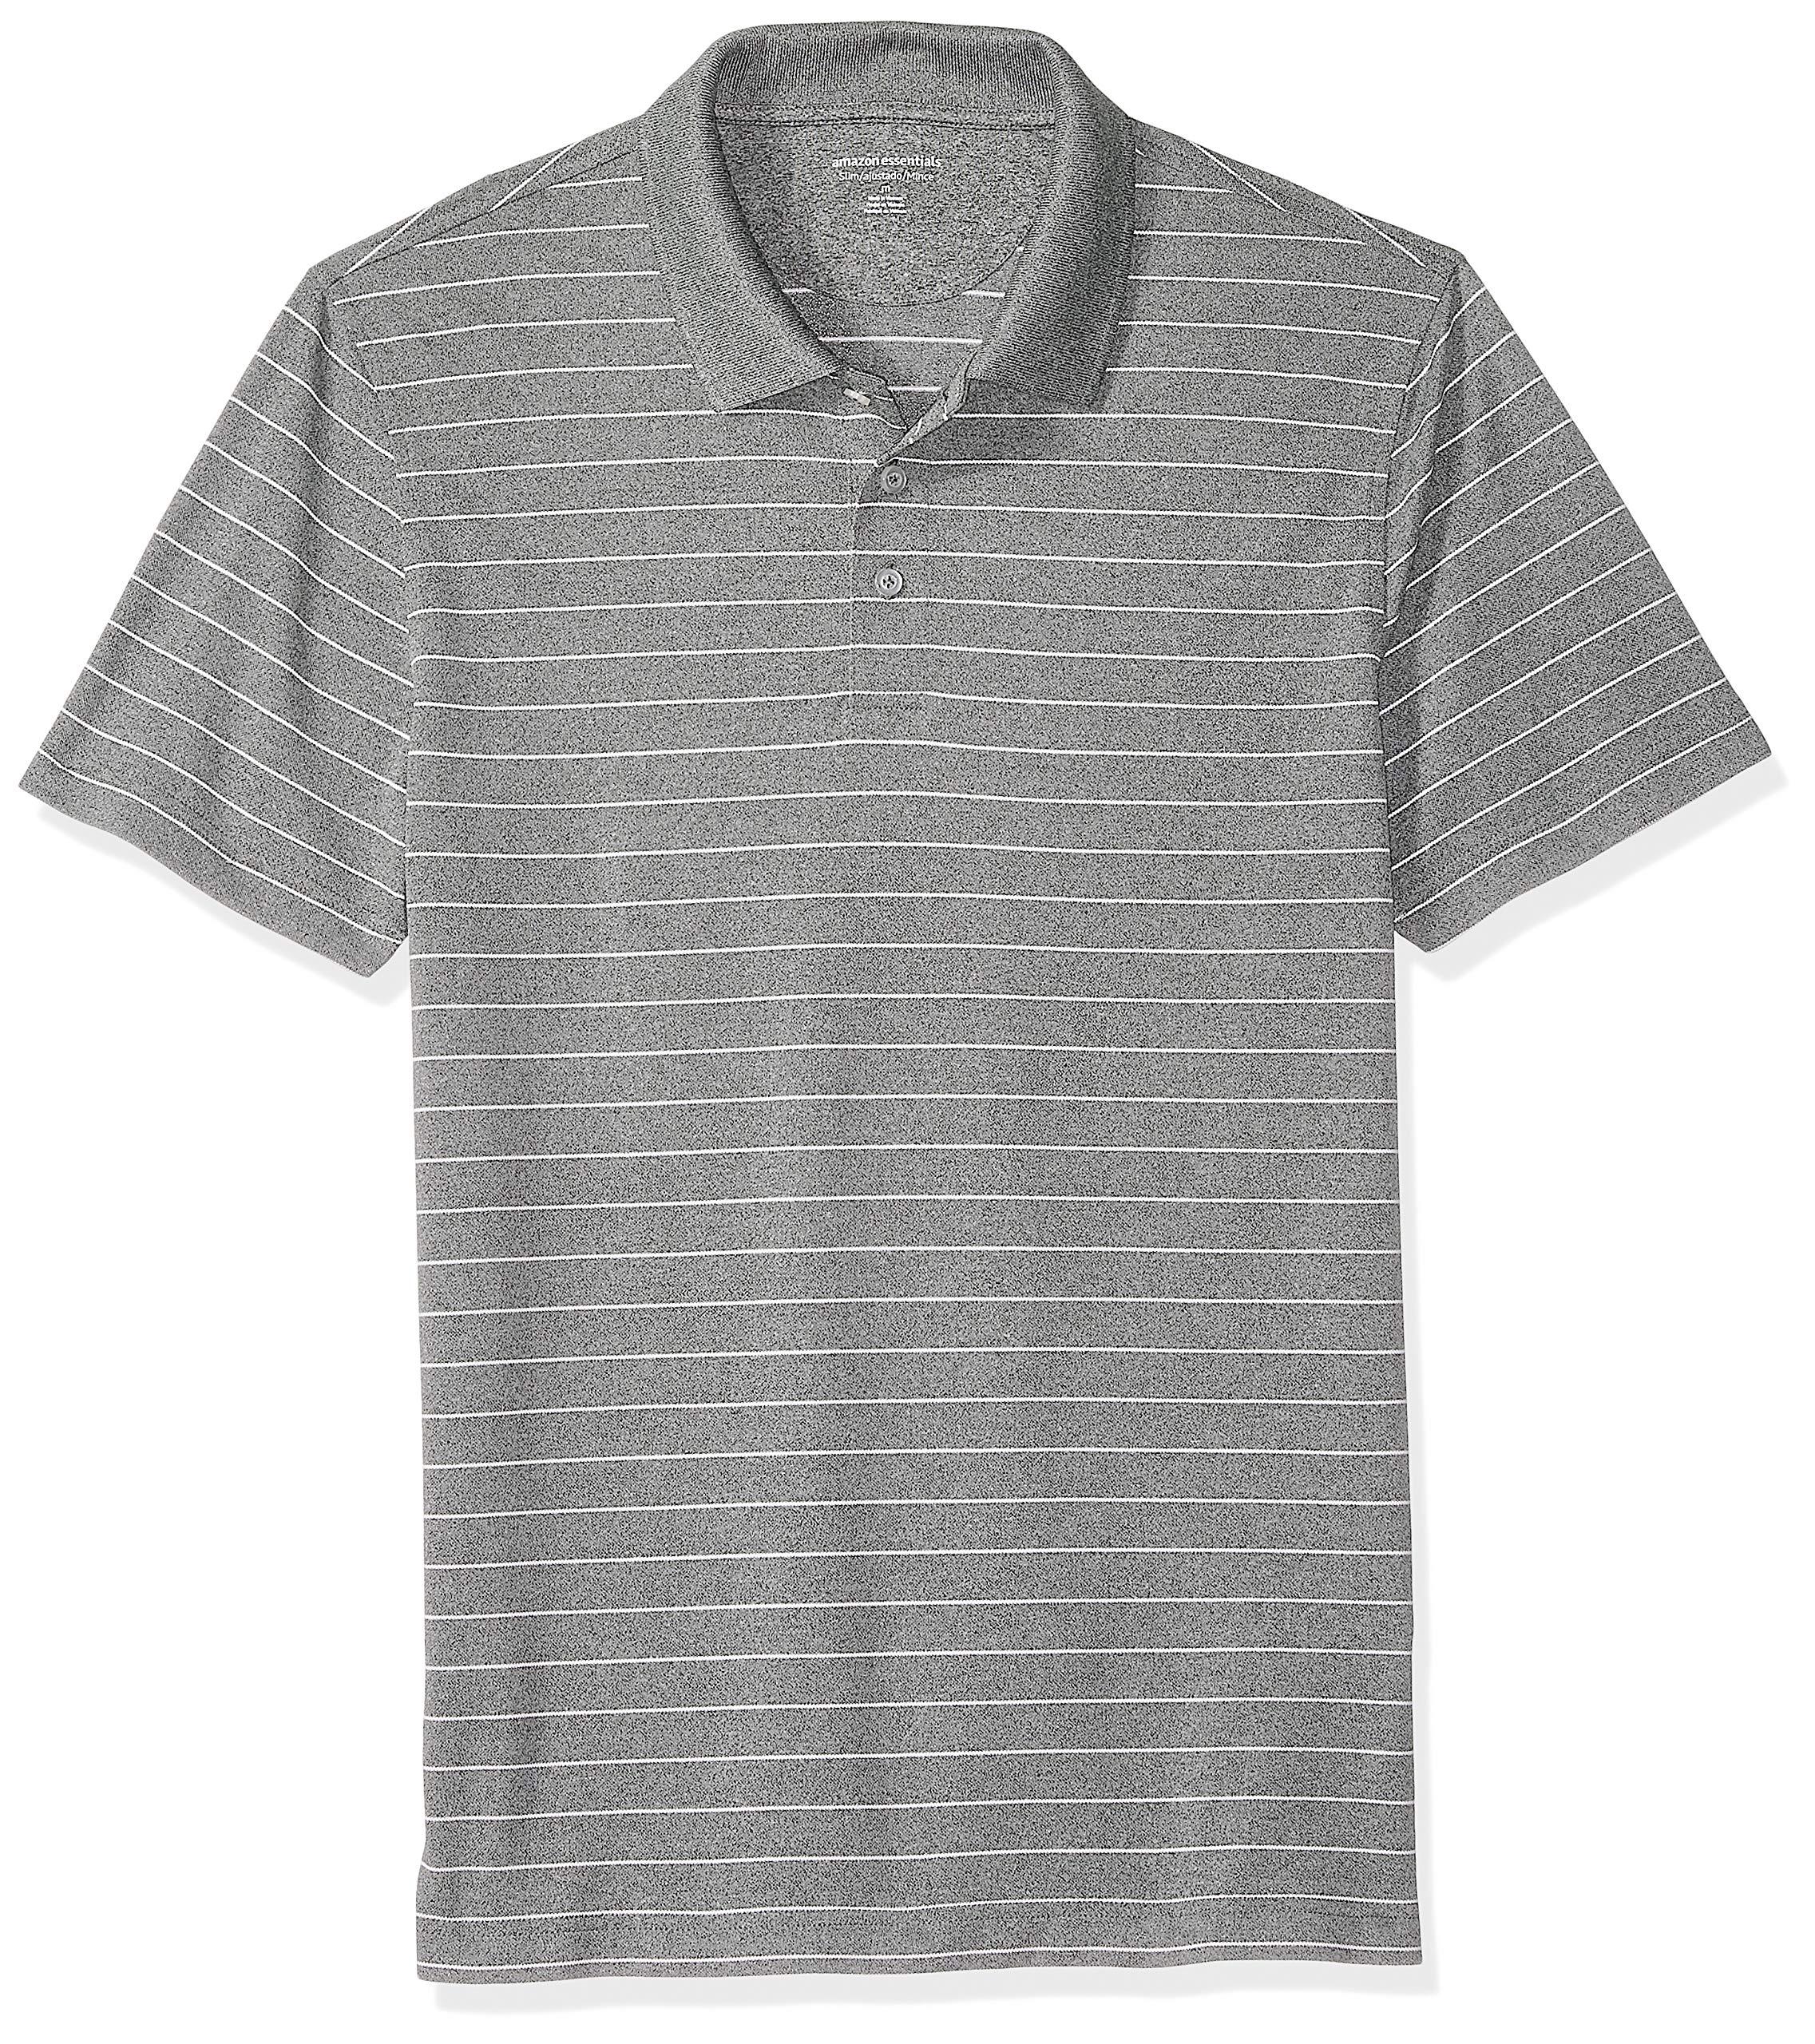 Amazon Essentials Men's Slim-Fit Quick-Dry Golf Polo Shirt, Medium Gray Heather Stripe, X-Small